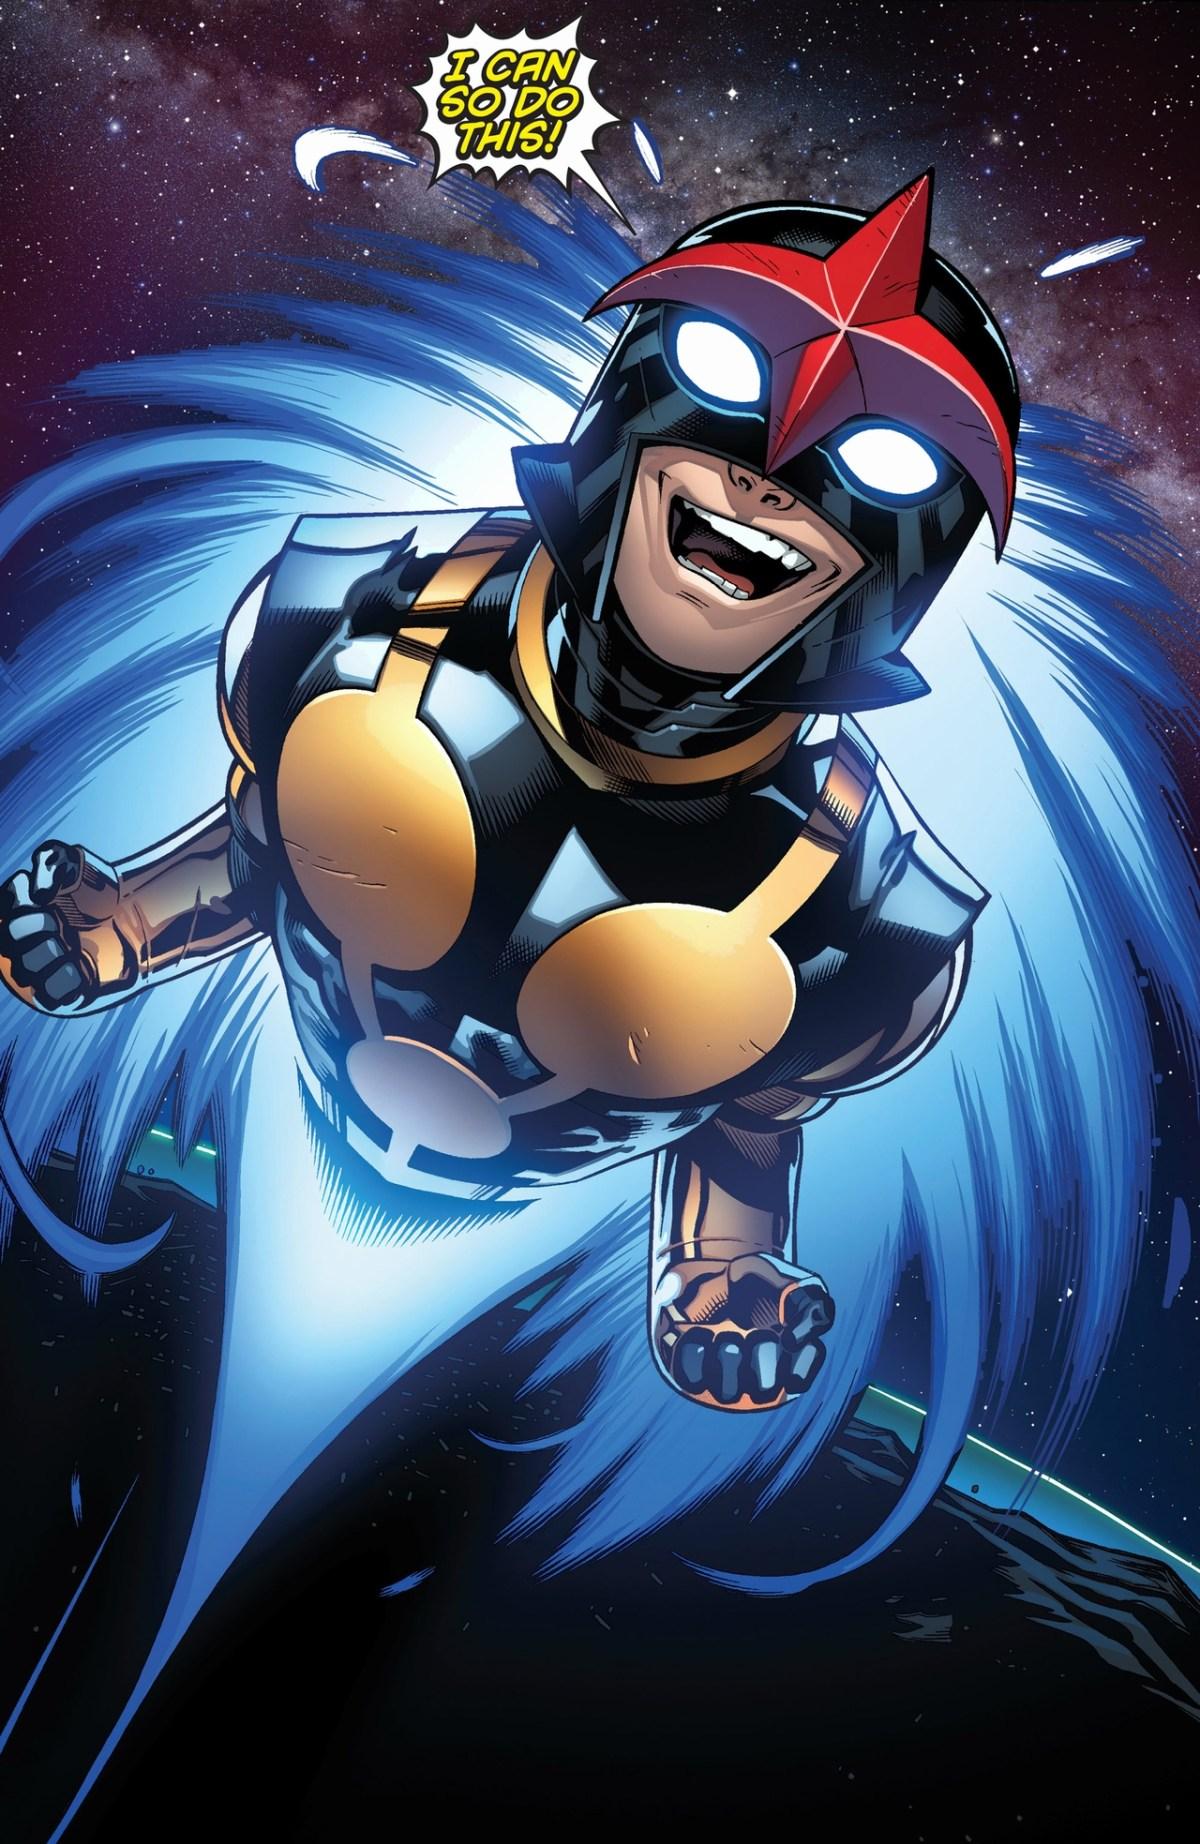 Latinx Superheroes: Sam Alexander as Nova in the Marvel Universe.